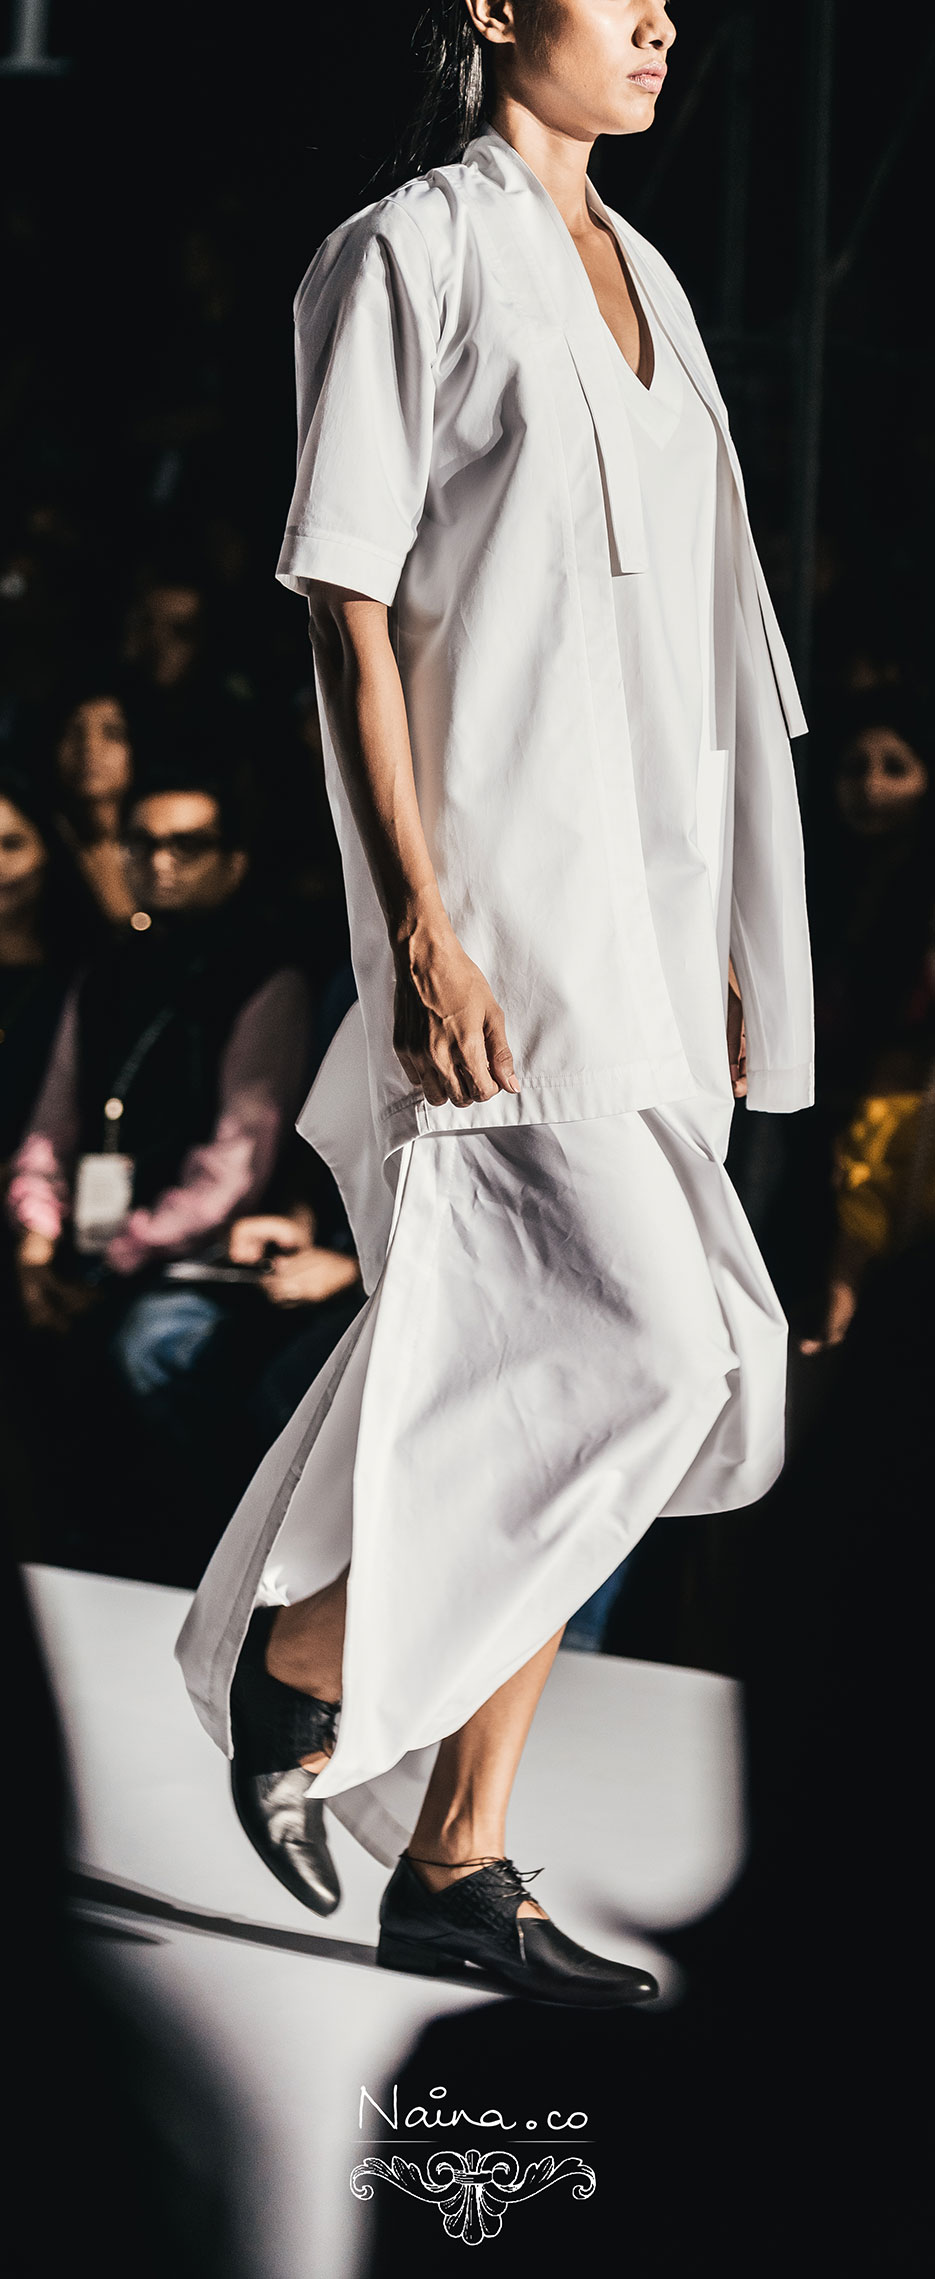 Wills Lifestyle India Fashion Week, Spring Summer 2013. Kallol Datta by photographer Naina Redhu of Naina.co